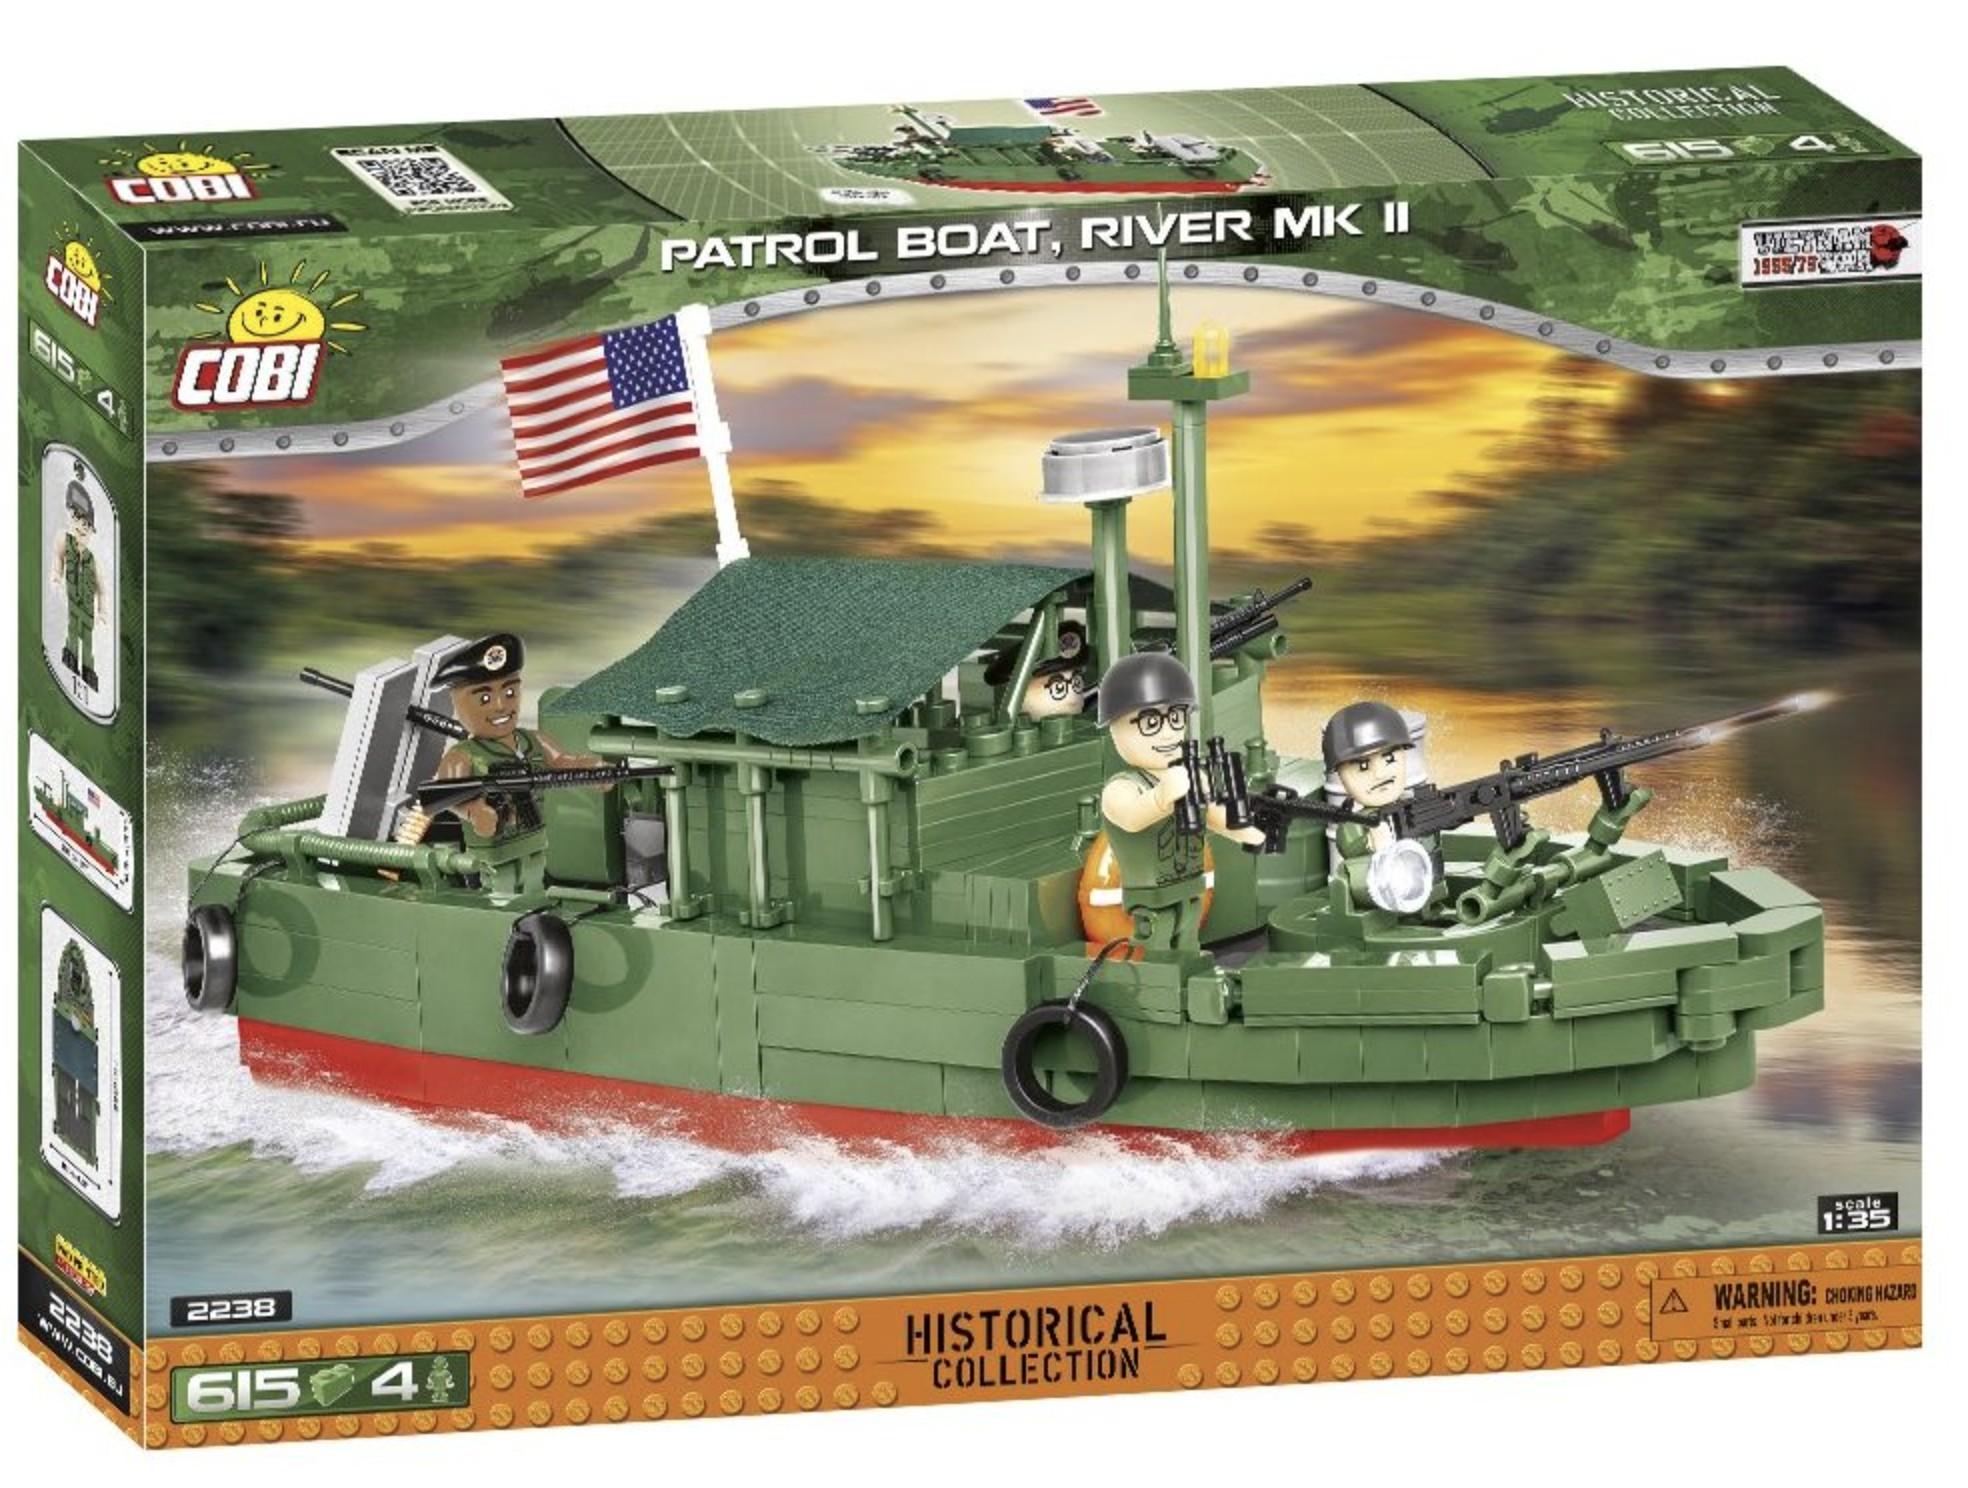 2238 - Patrol Boat River Mk II photo